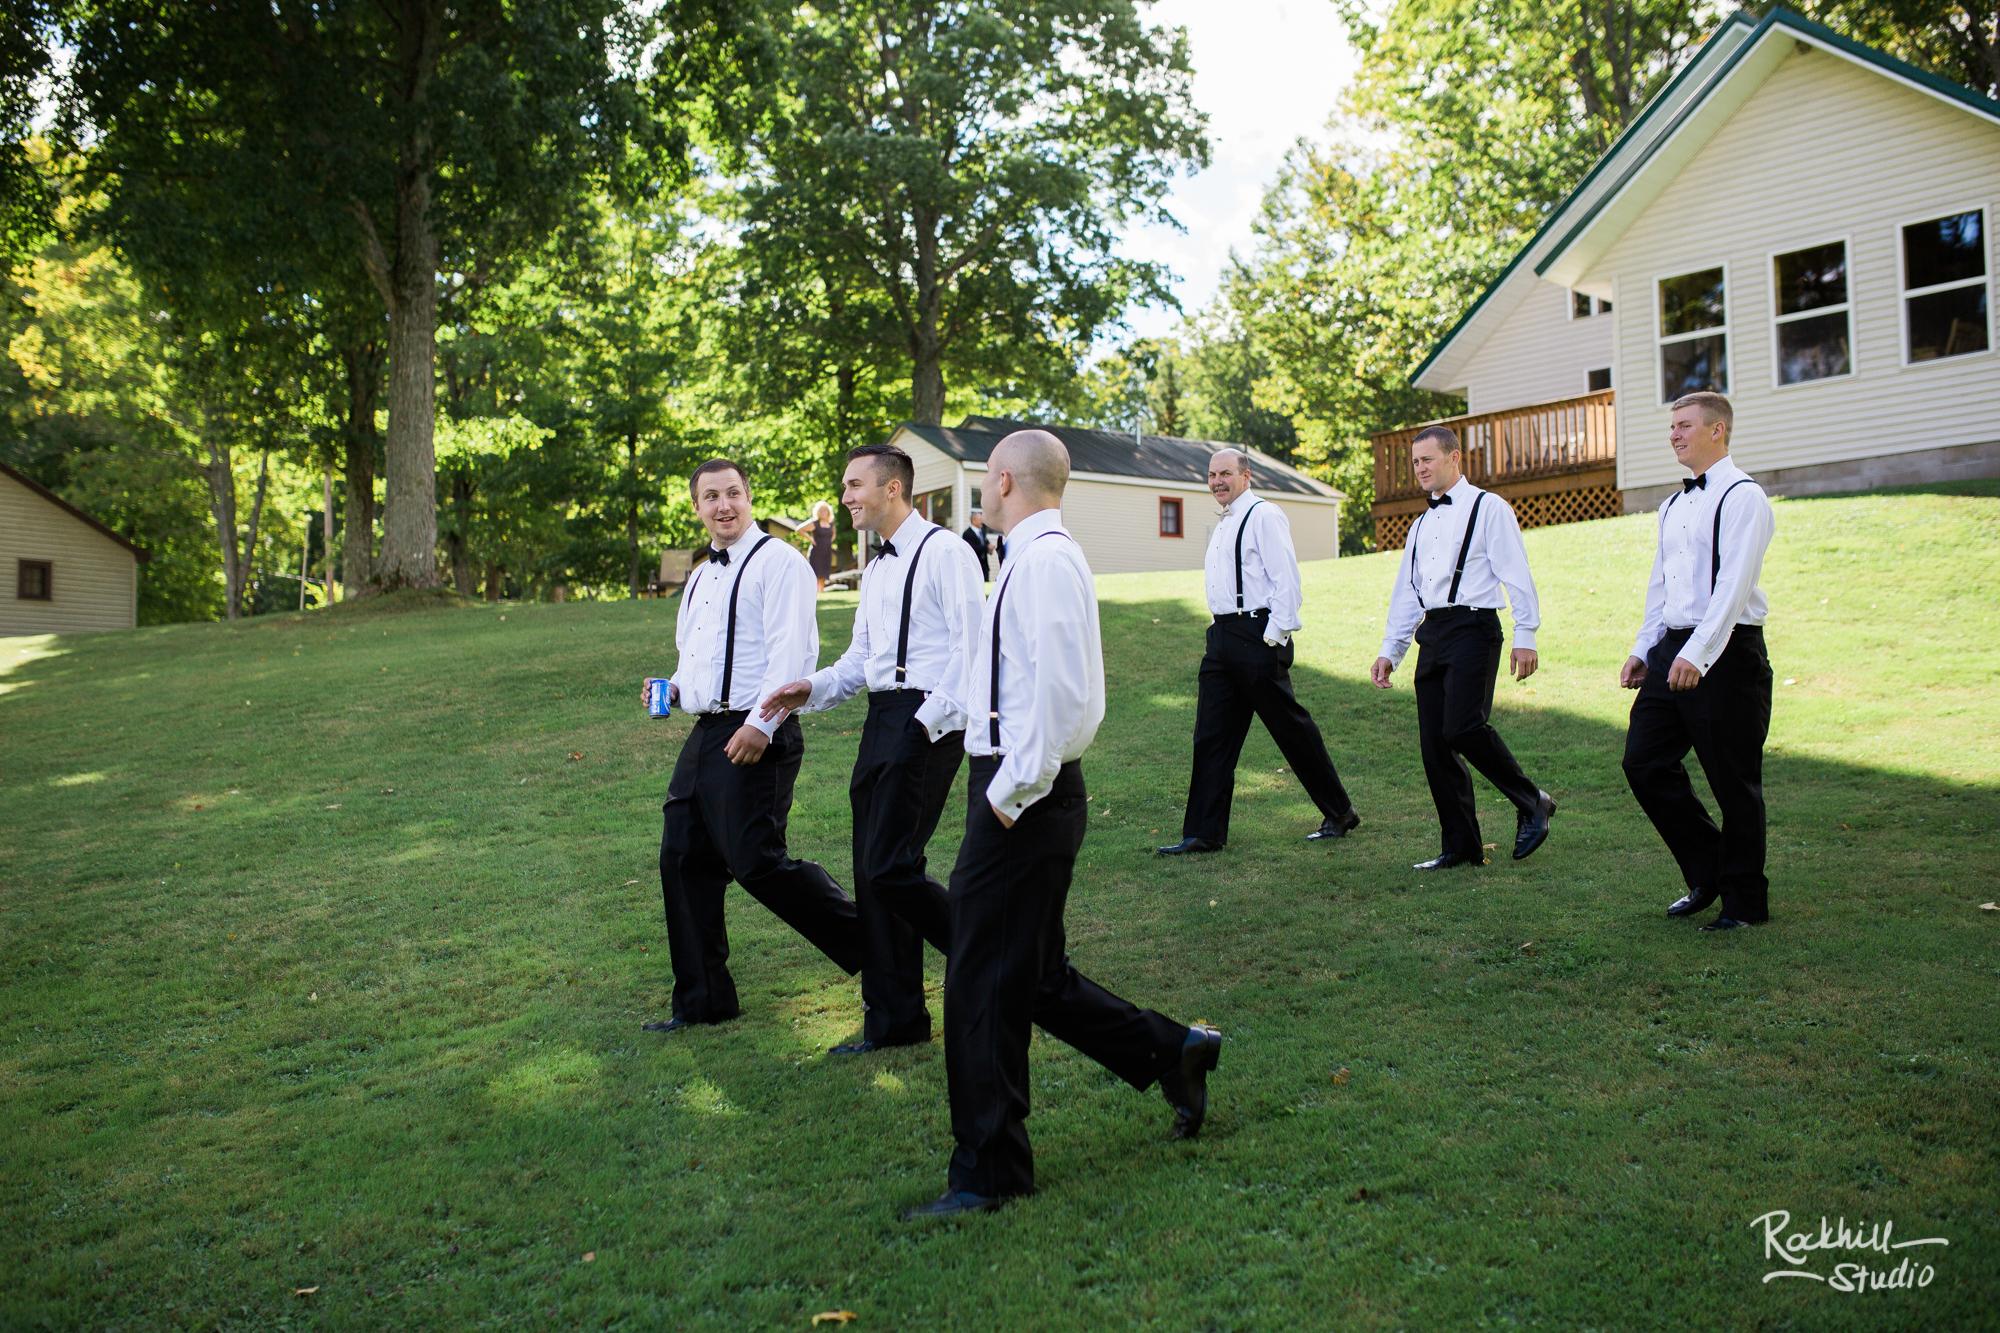 rockhill-studio-newberry-michigan-wedding-groomsmen-walking-fun.jpg